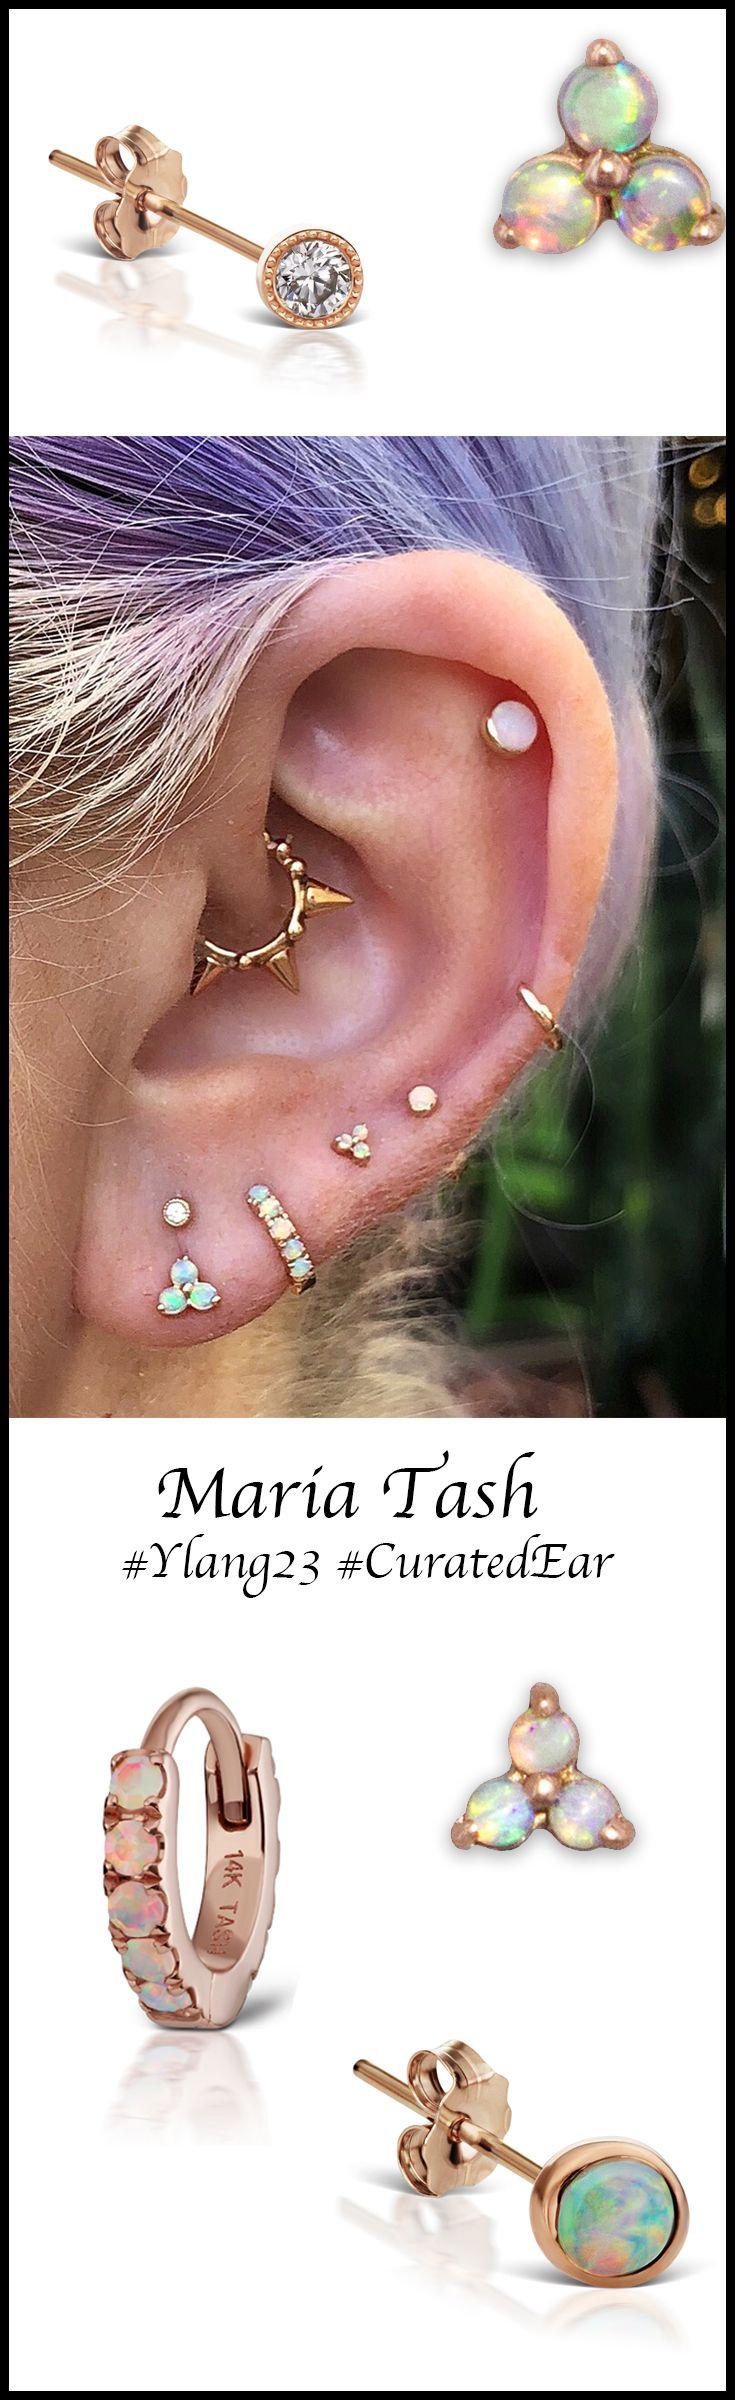 Maria Tash #Ylang23 #CuratedEar